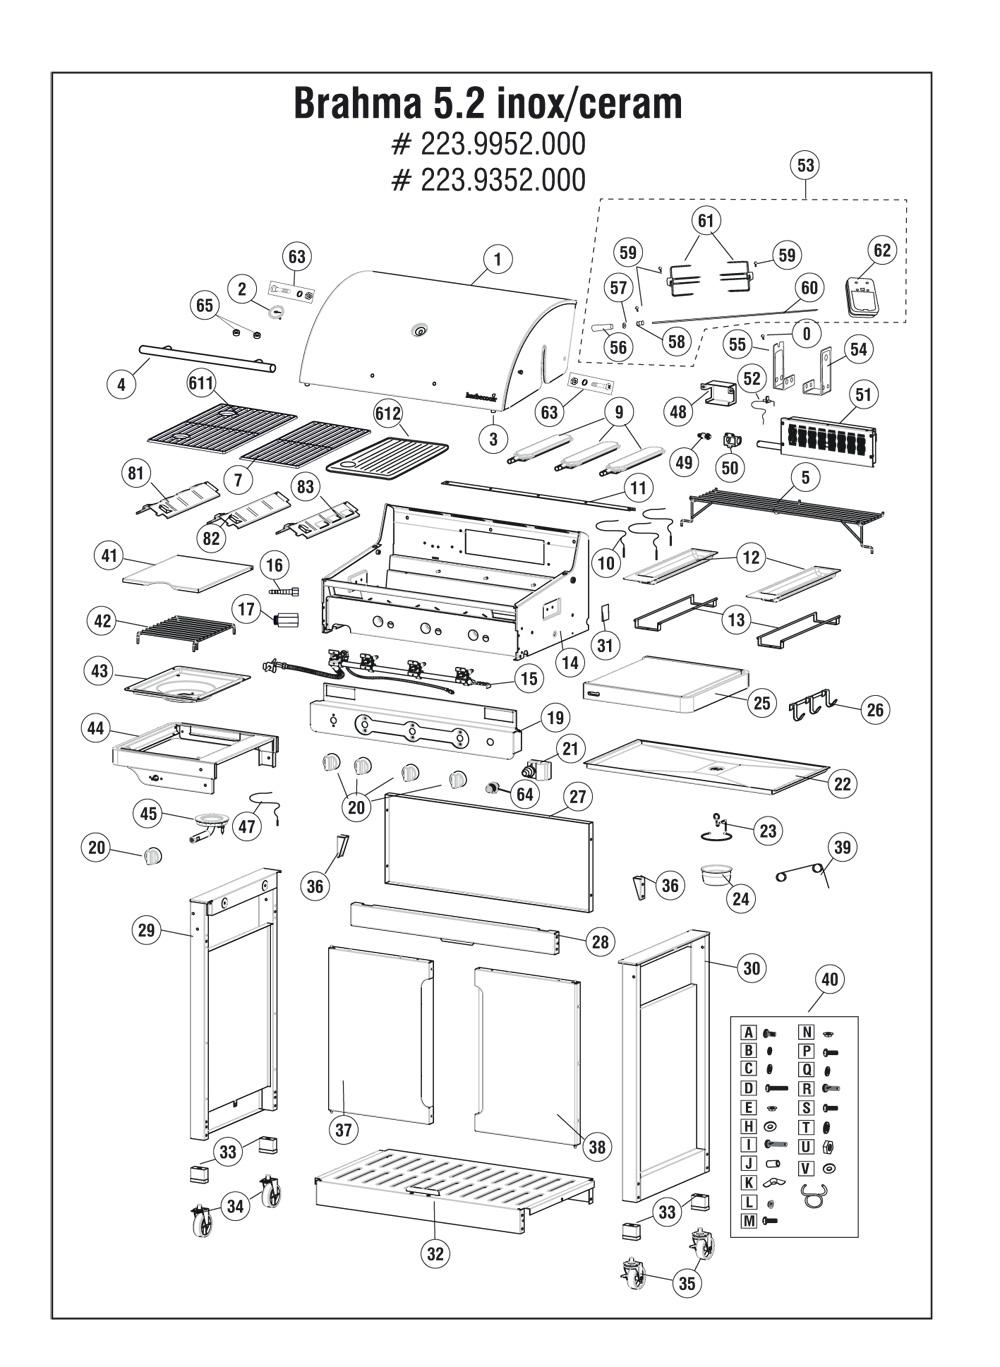 hauptbrenner f r barbecook gasgrill brahma 5 2 inox. Black Bedroom Furniture Sets. Home Design Ideas